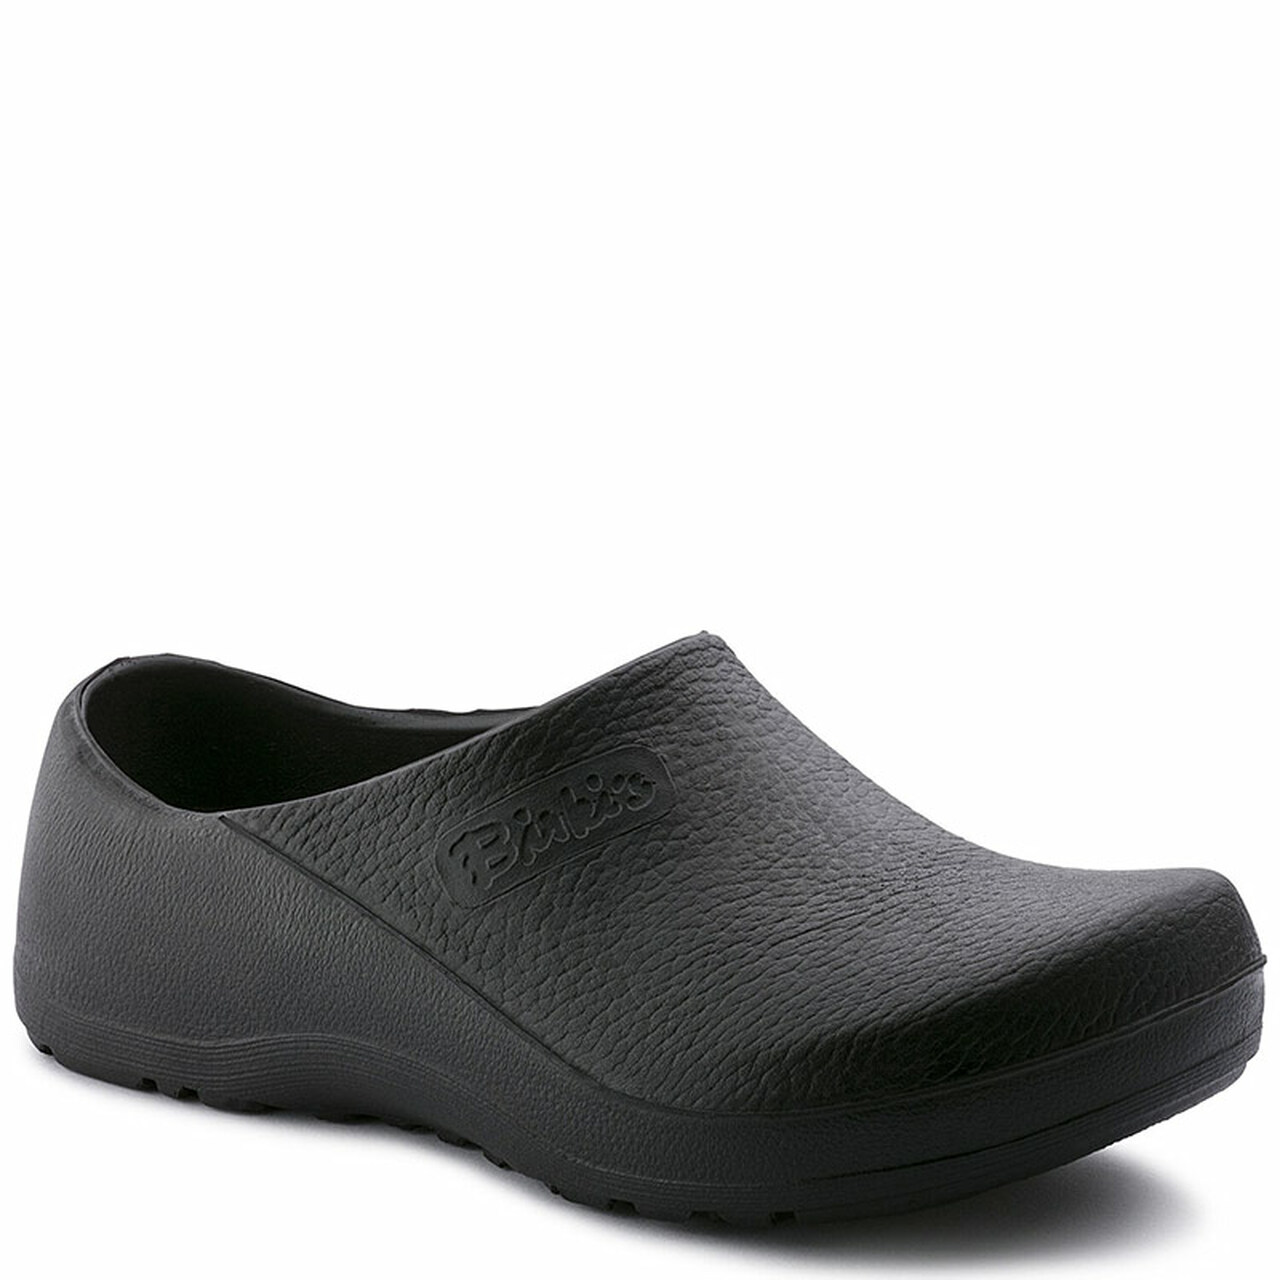 PROFI-BIRKI Slip Resistant Clogs Black